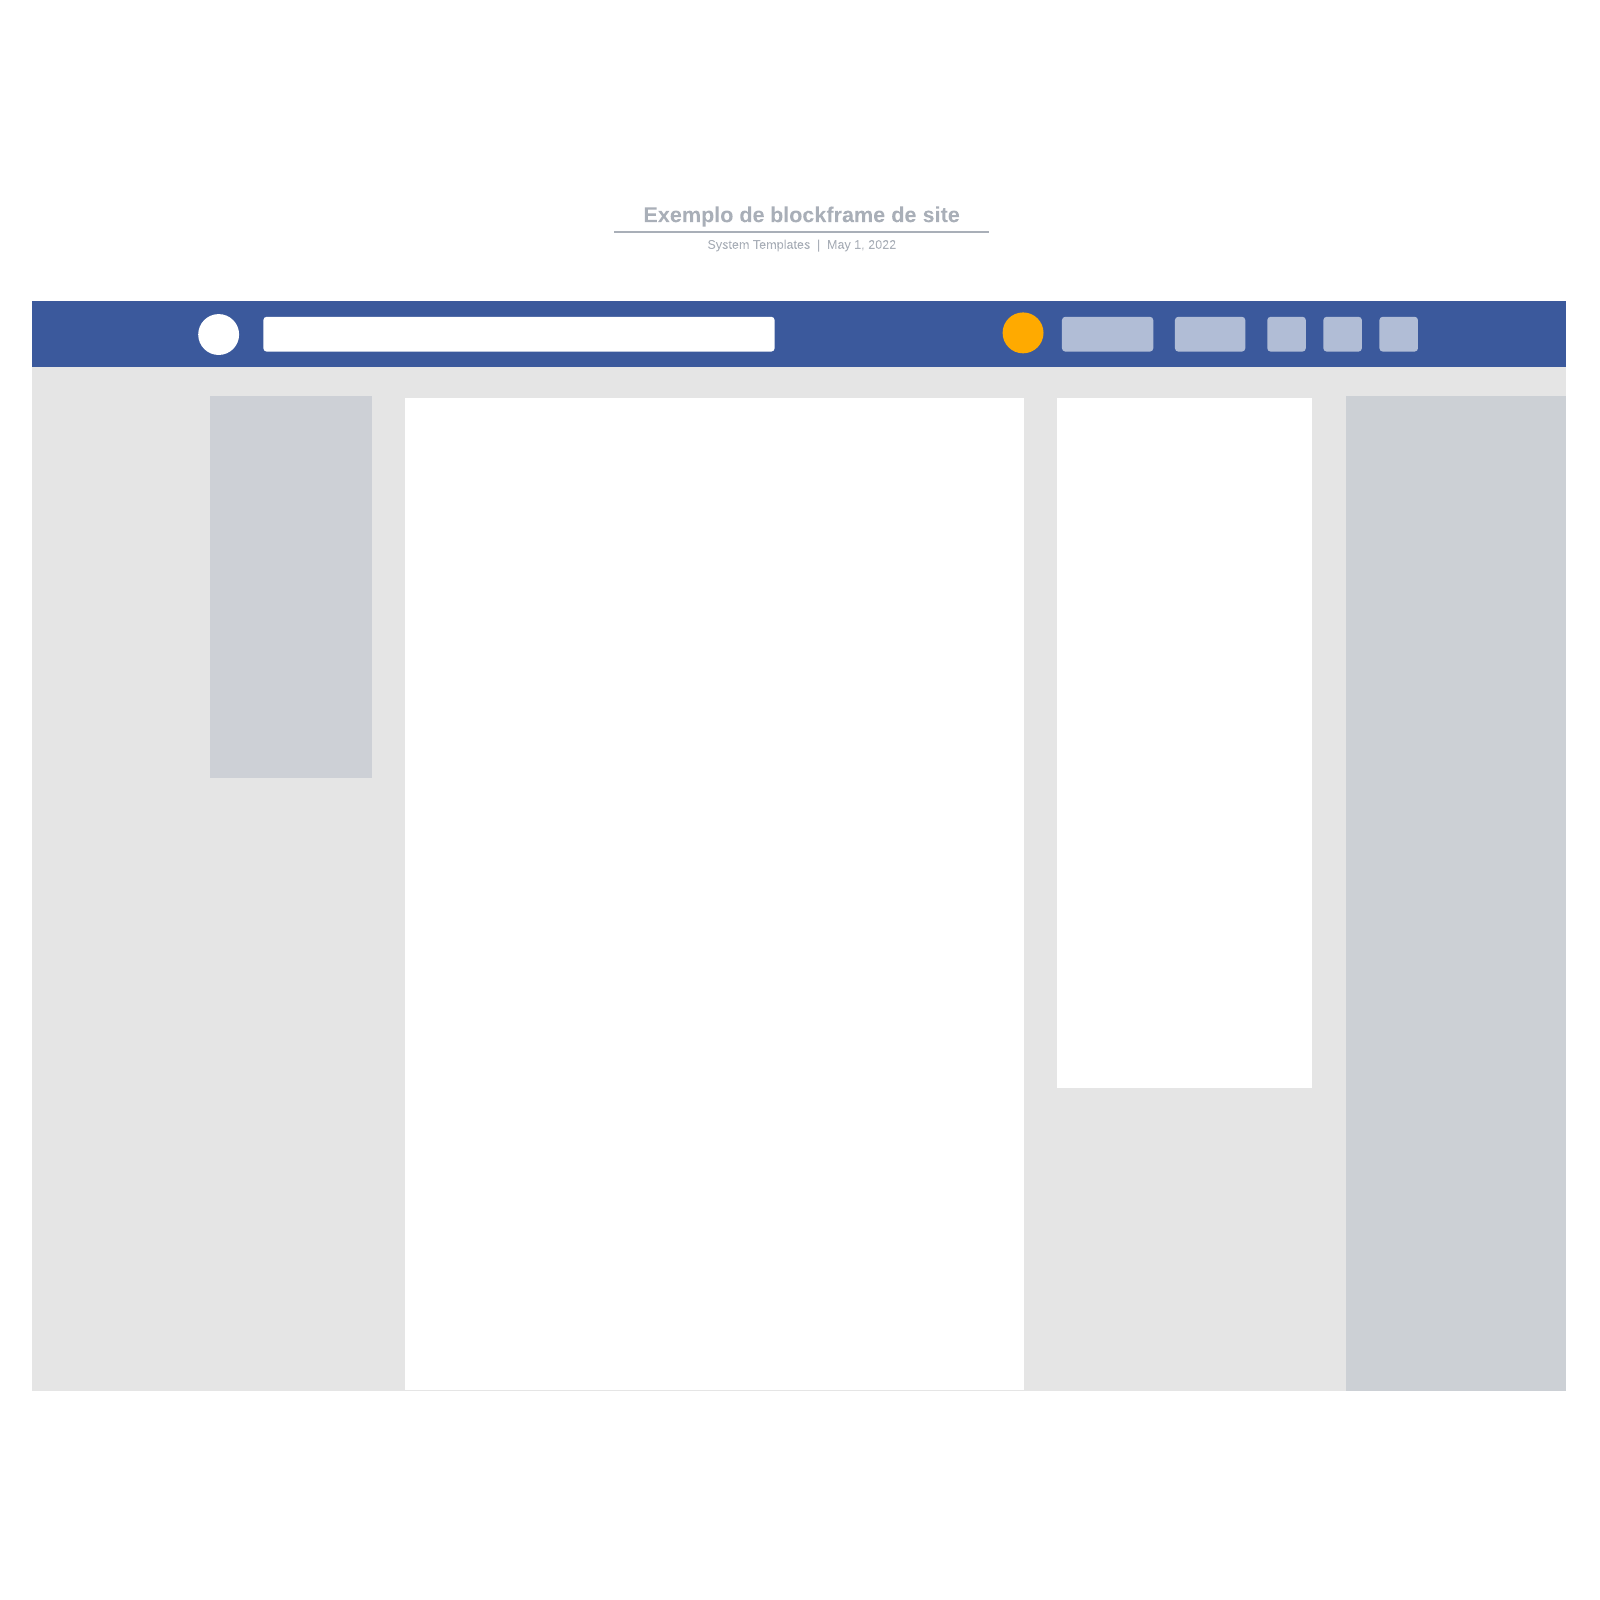 Exemplo de blockframe de site